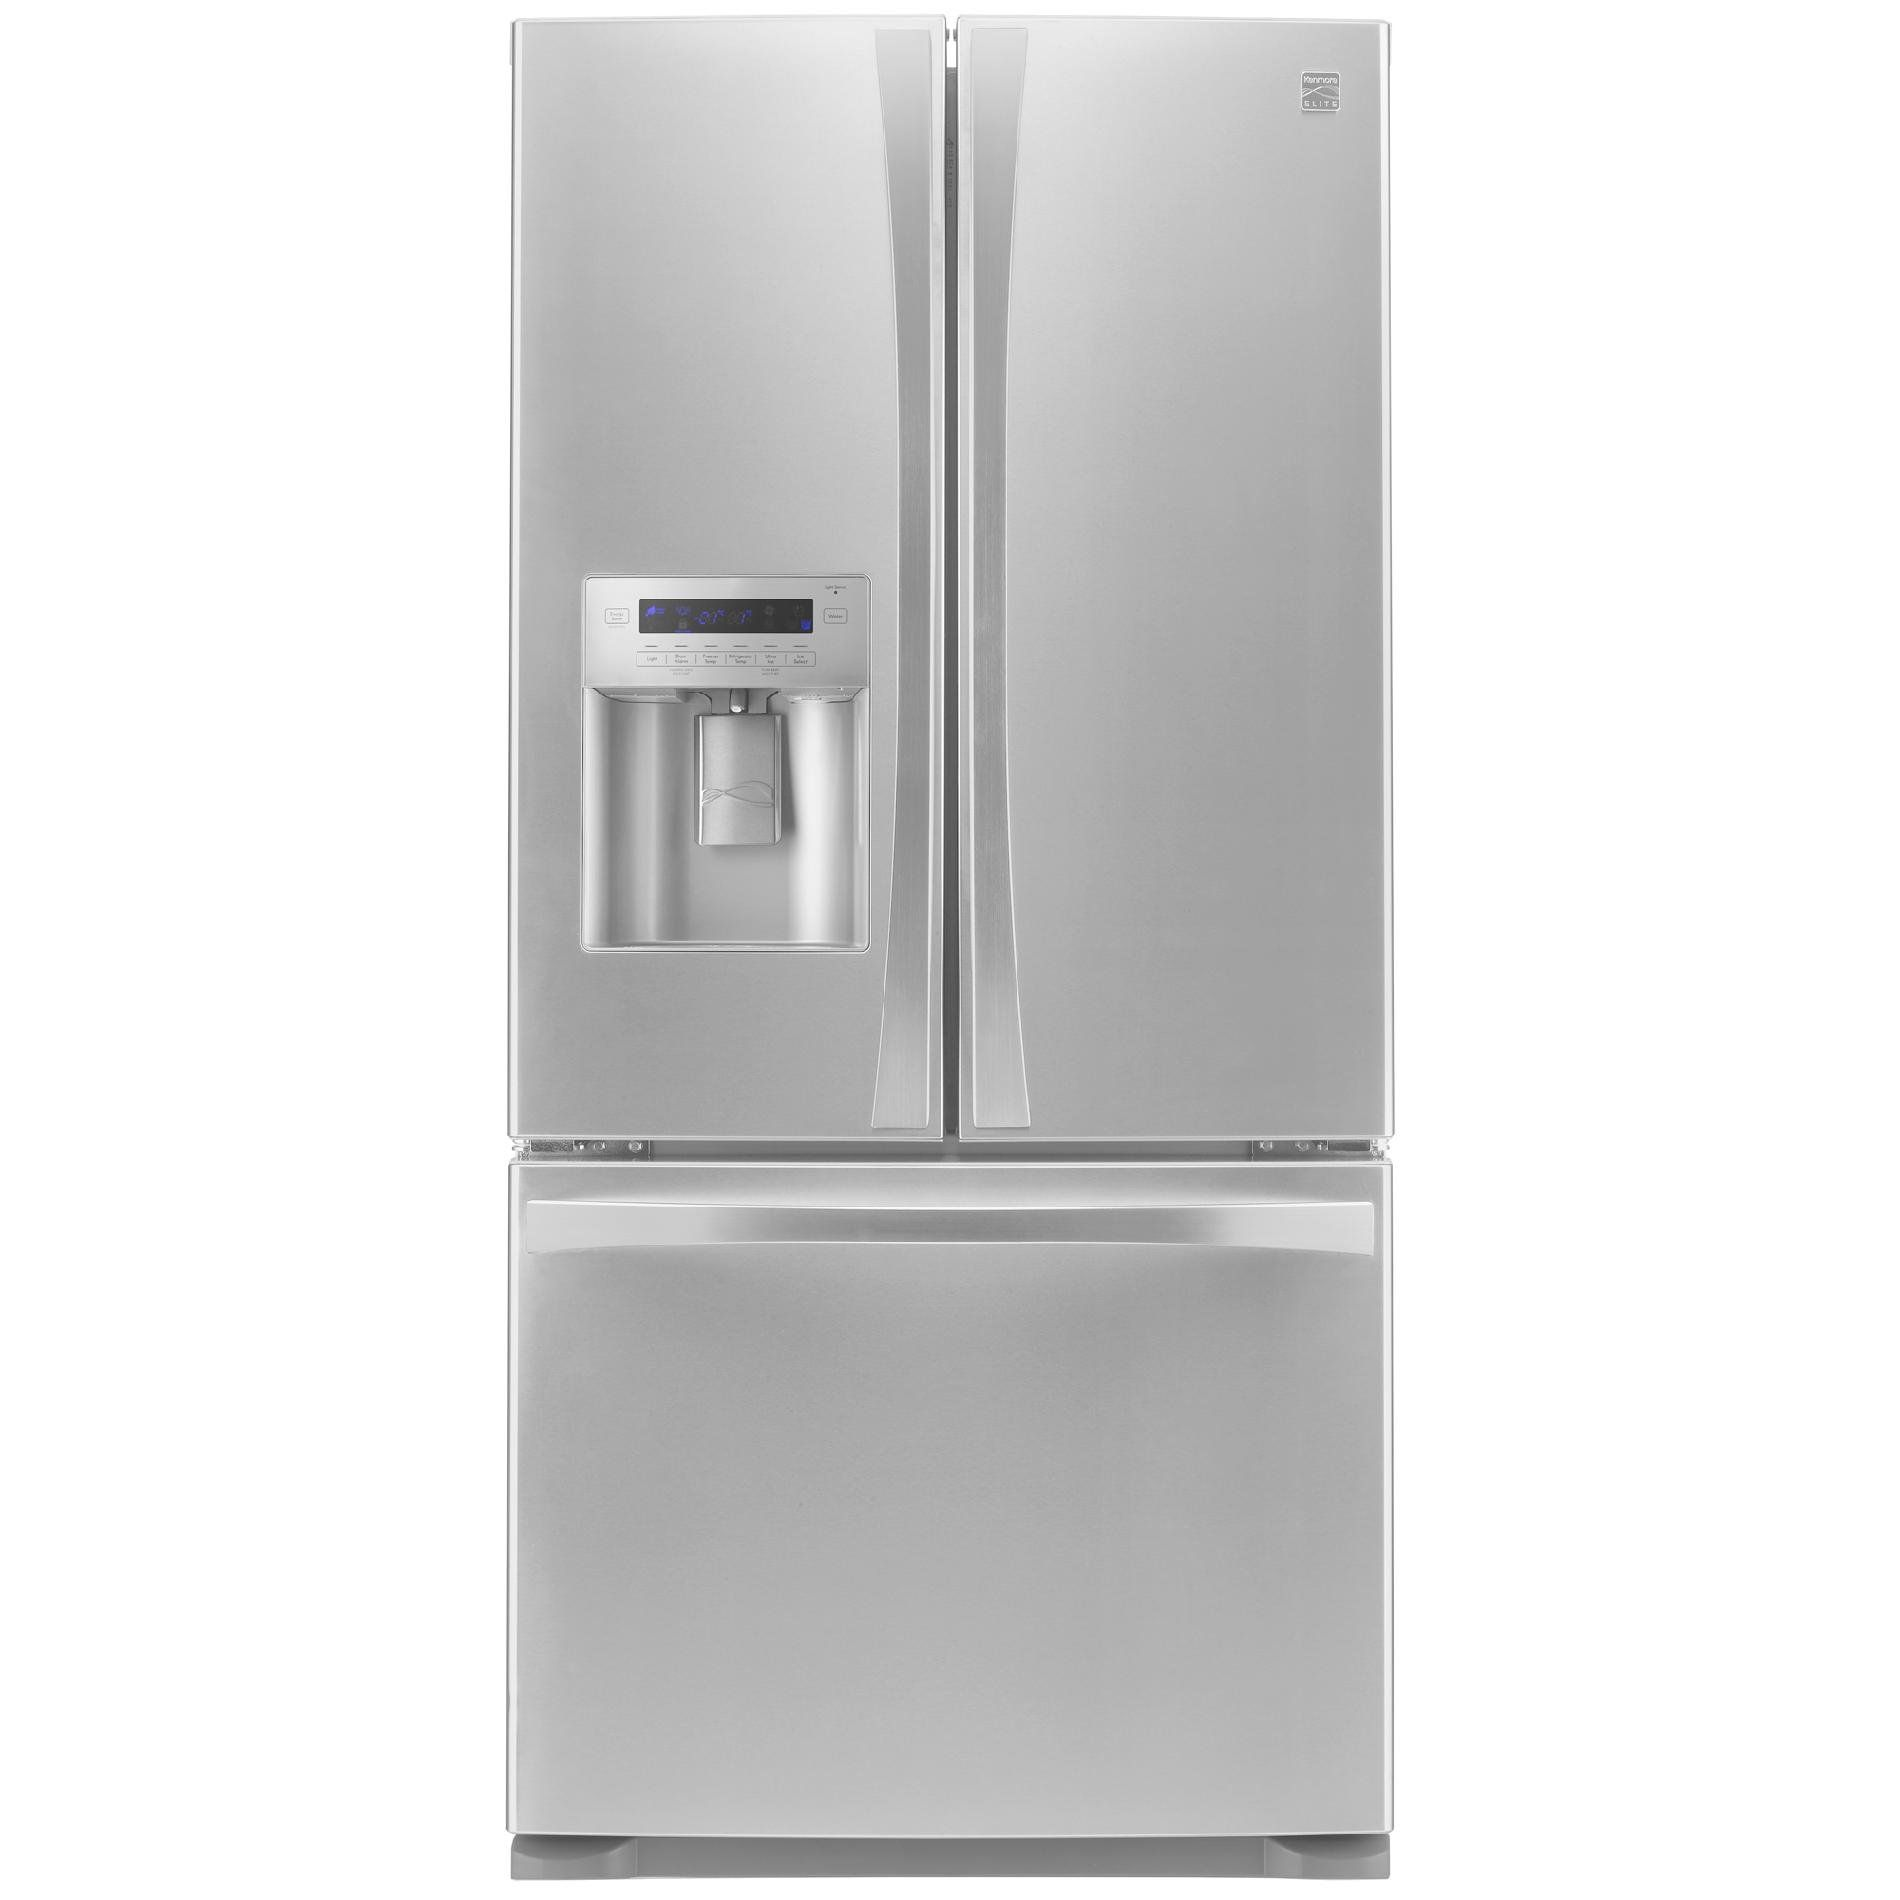 Kenmore Elite 72483 29 9 Cu Ft 4 Door Bottom Freezer Refrigerator W Dispenser Stainless Steel In 2020 Bathroom Organization Diy Fridge French Door Fridge Organization